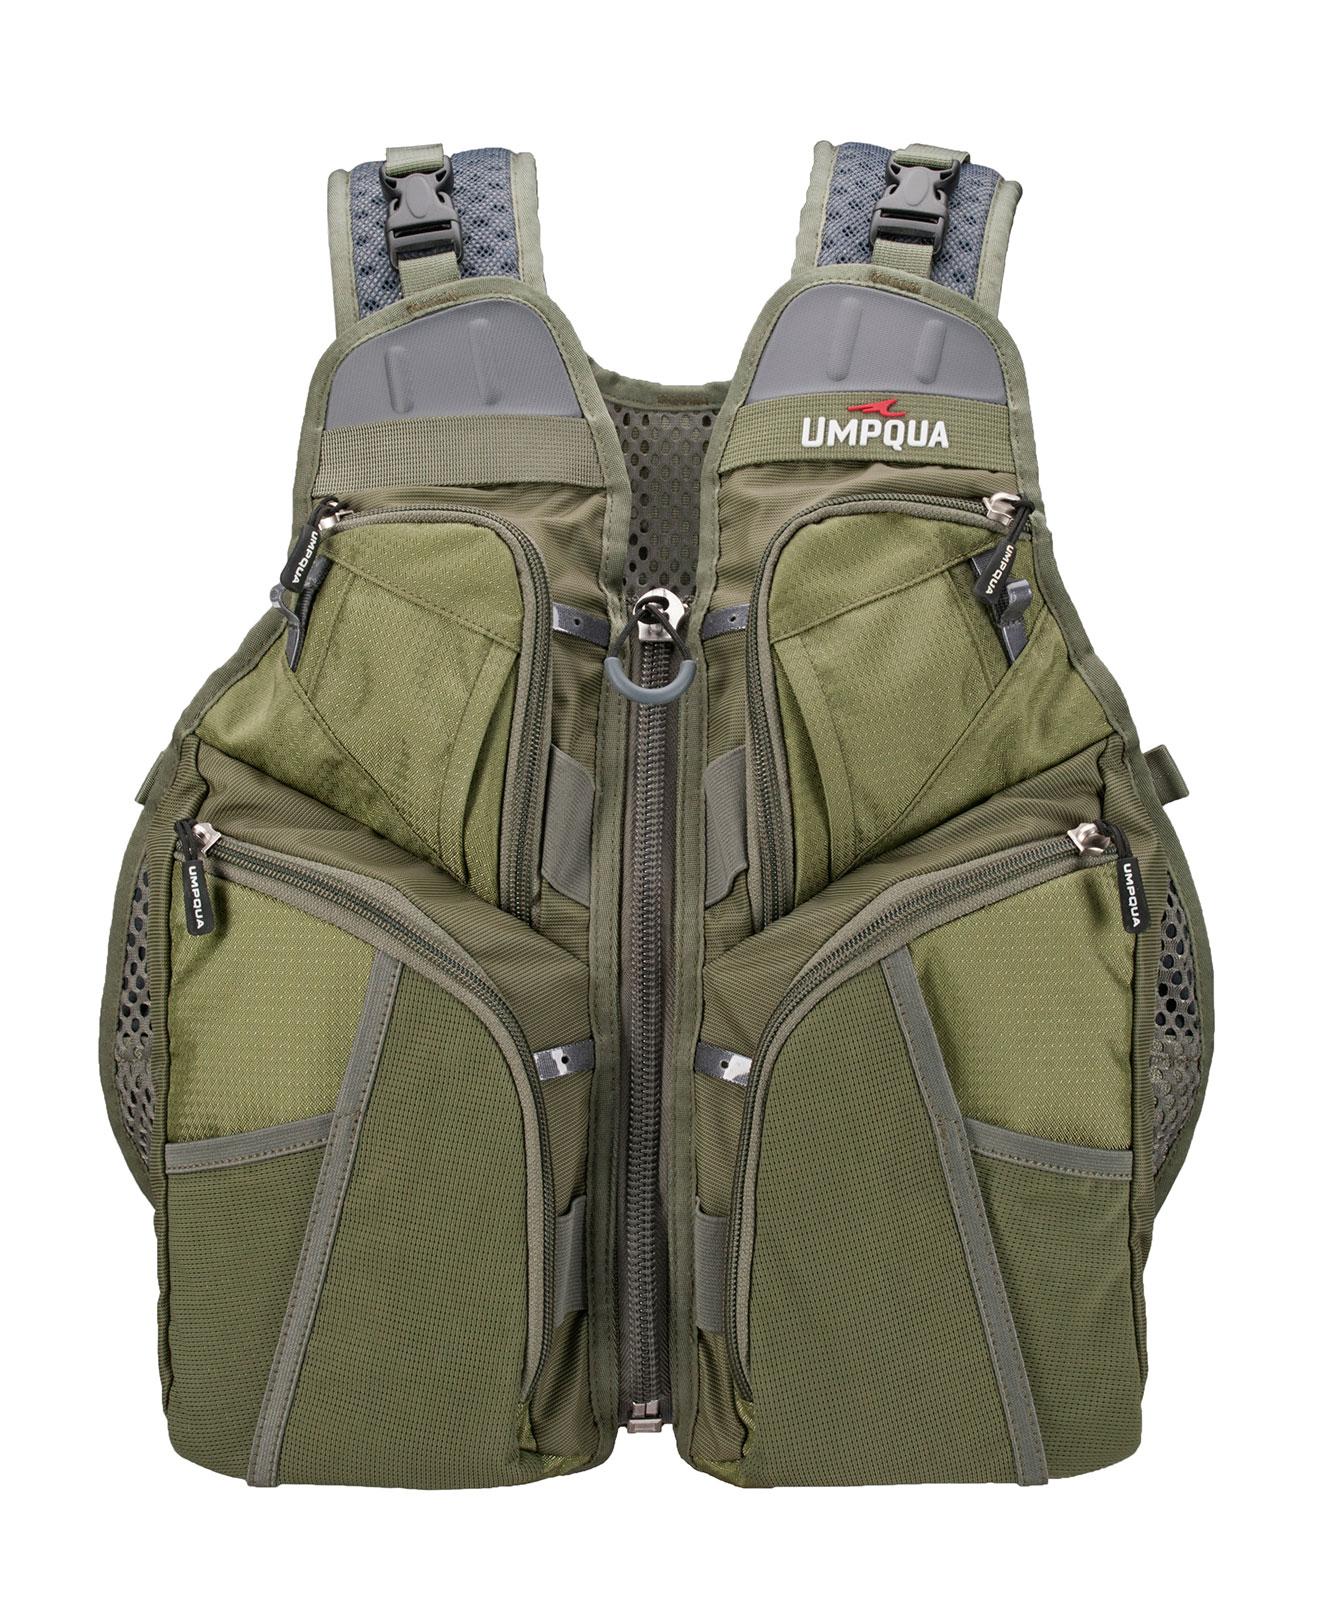 Umpqua Toketee Fly Fishing Tech Pack Vest Wading Apparel Gear | eBay